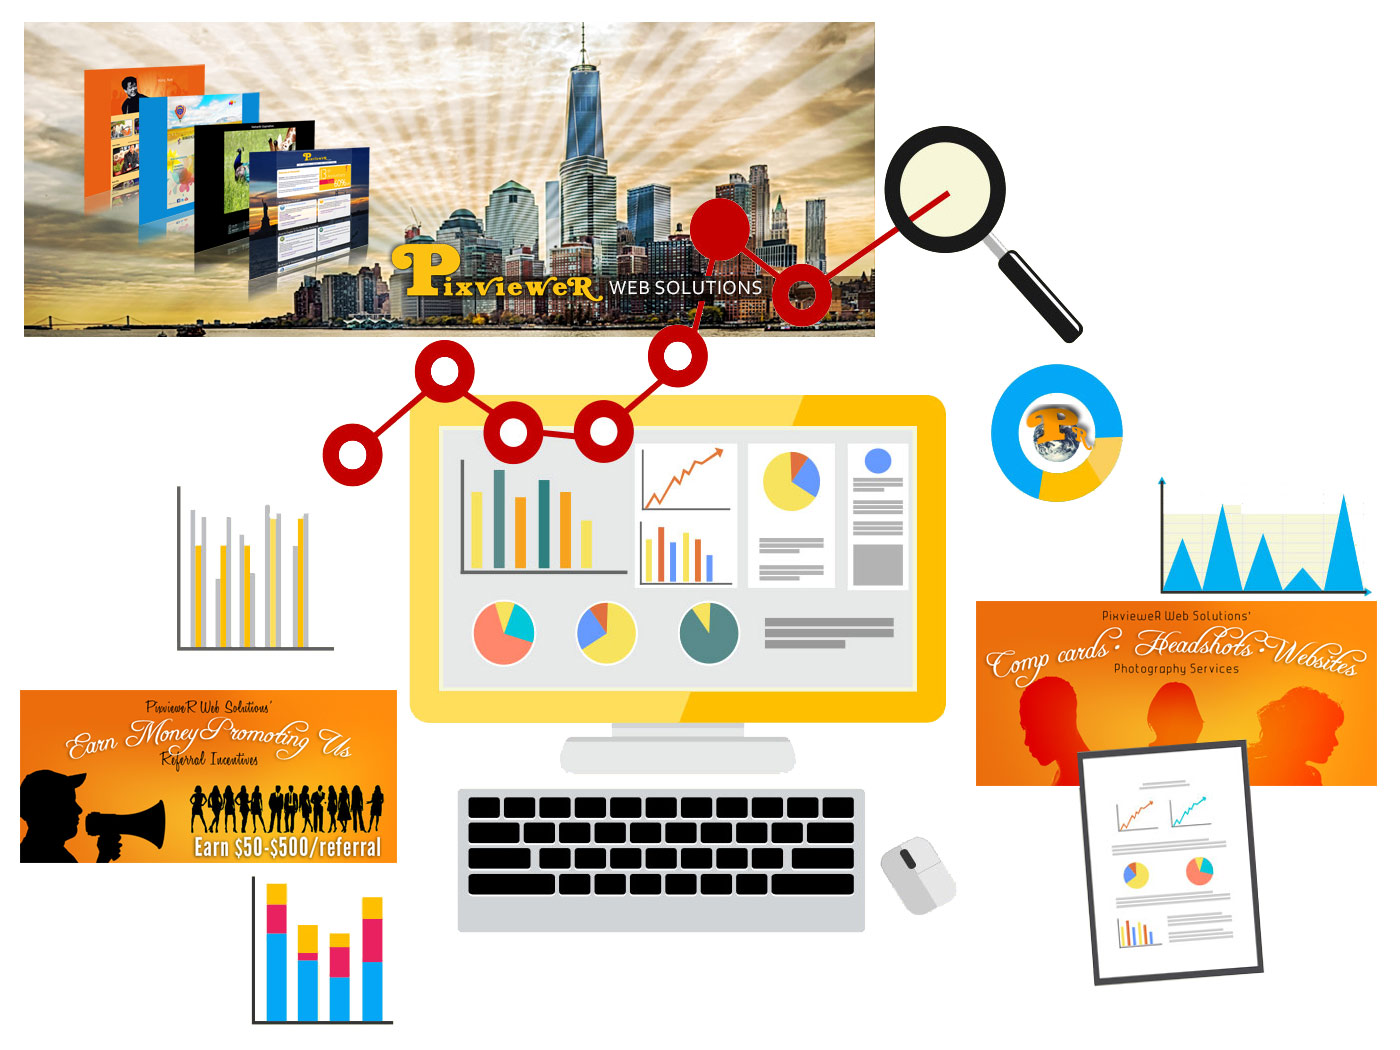 Pixviewer Web Solutions Branding